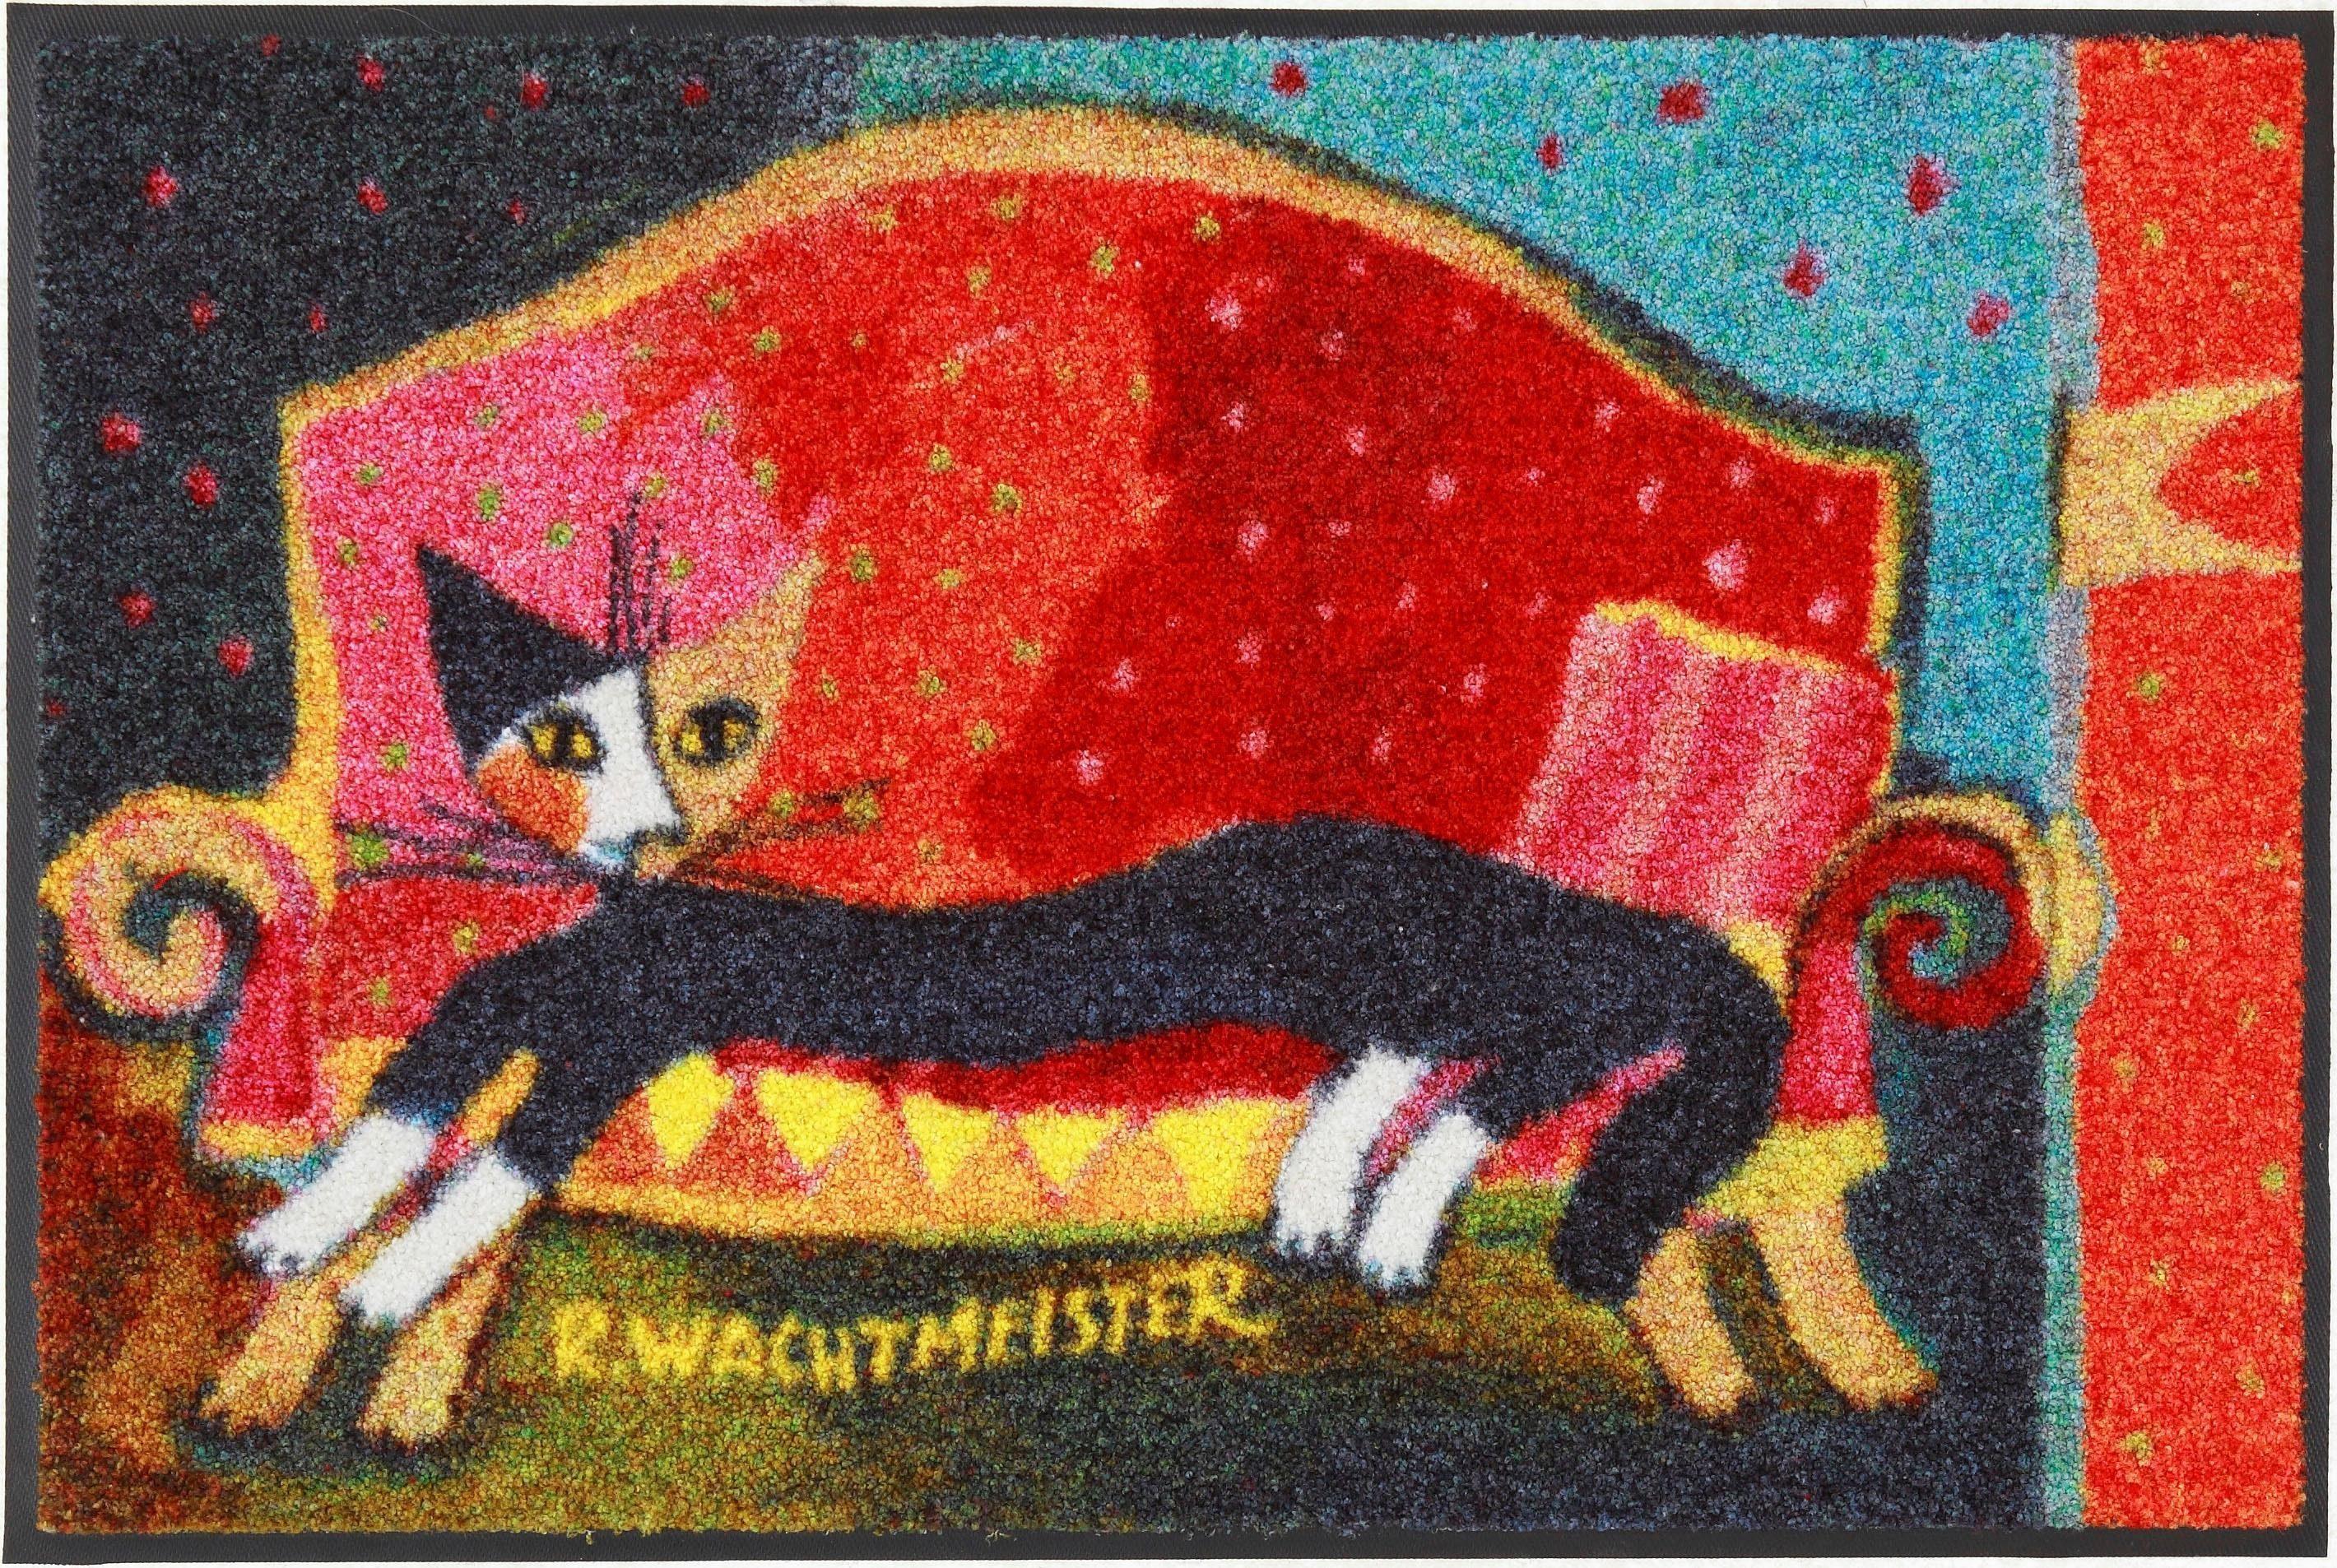 Fußmatte »Resting Place«, Rosina Wachtmeister, rechteckig, Höhe 6 mm